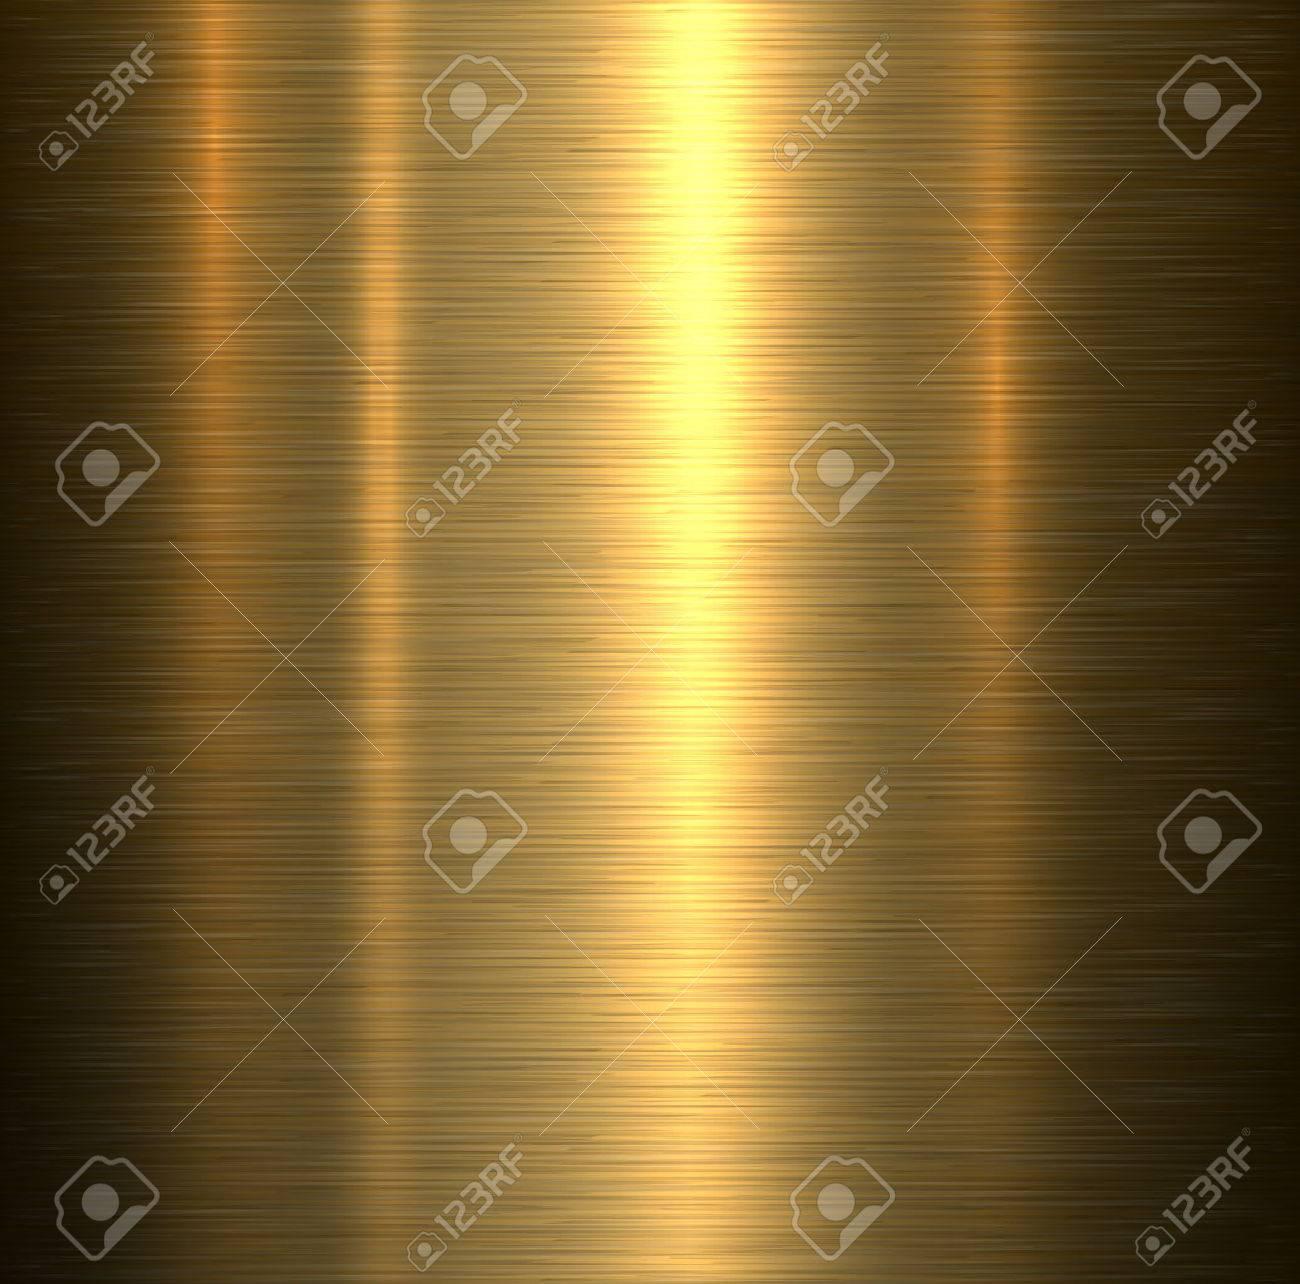 Brushed Brass Texture Brushed Metallic Texture